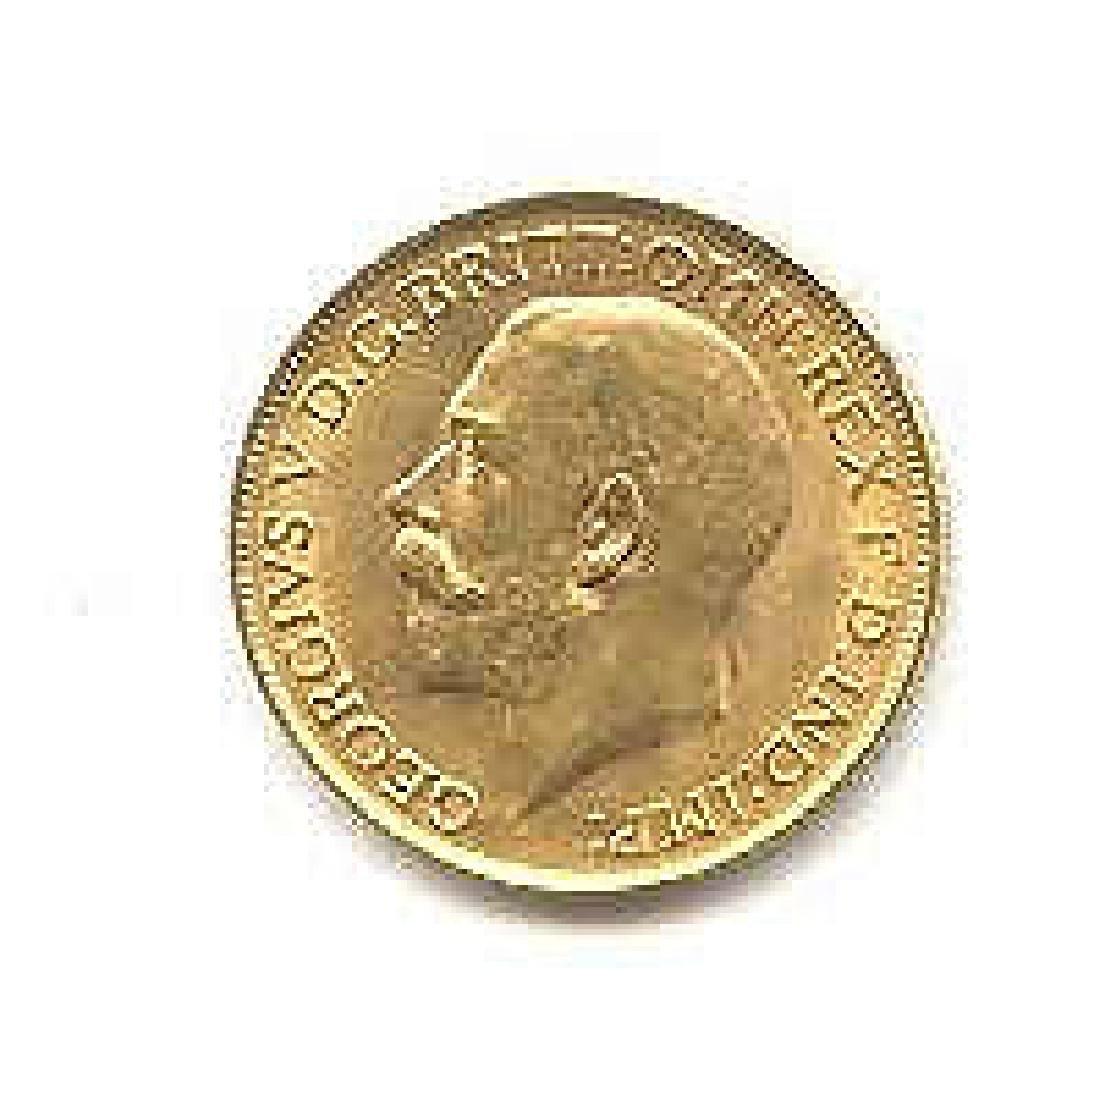 English Sovereign (King or Queen) Gold Coin Our Choice